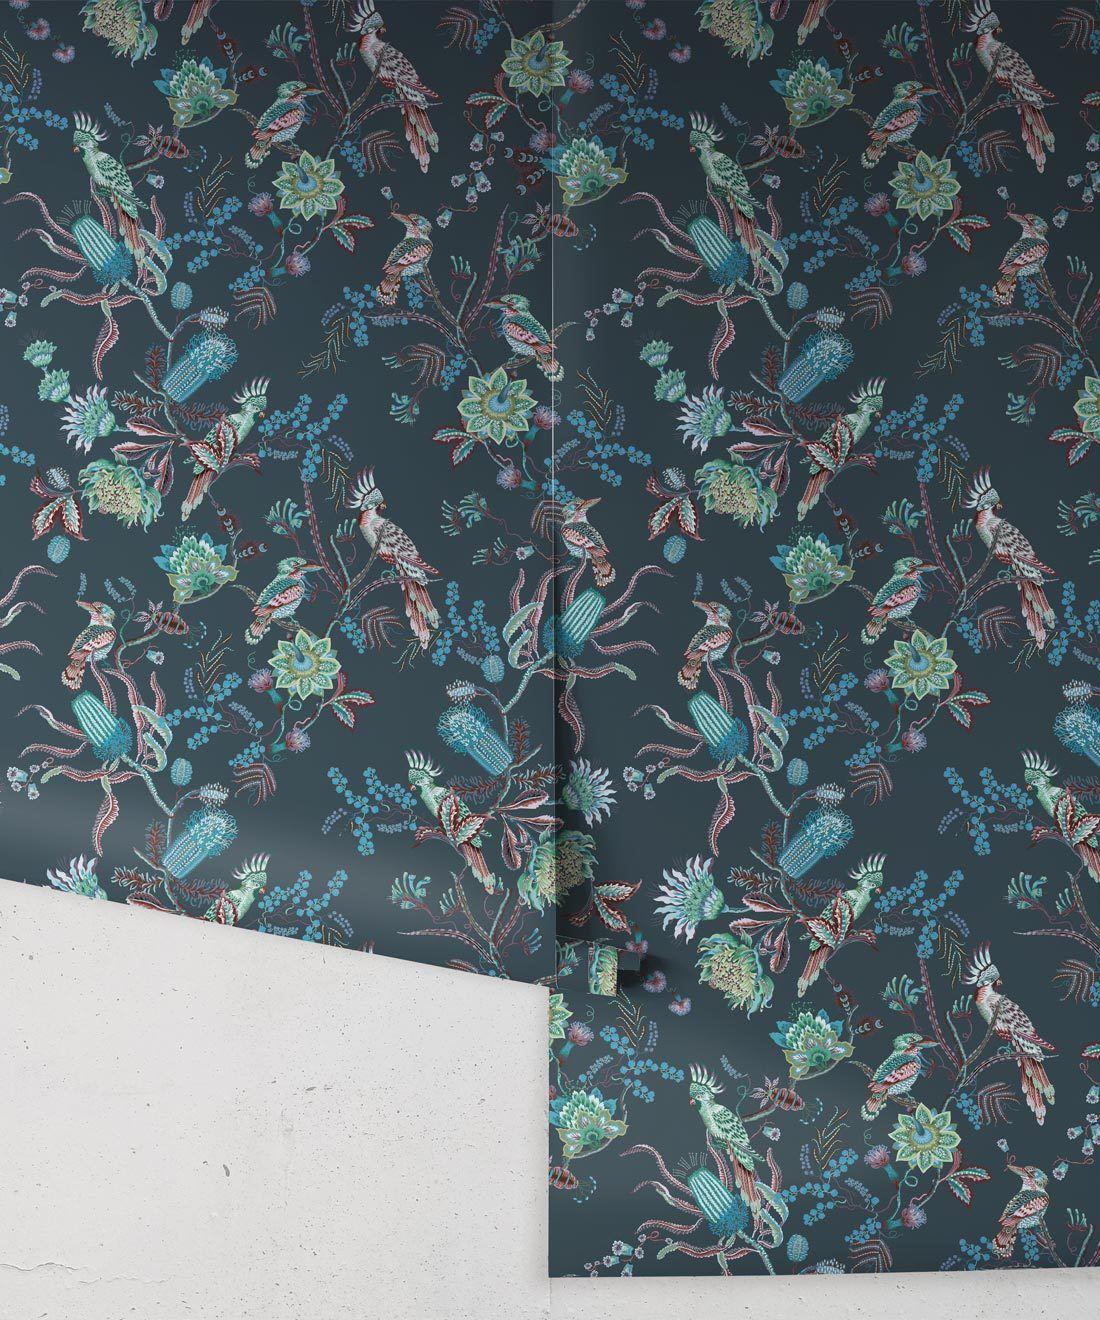 Matilda Wallpaper • Cockatoo, kookaburra • Australian Wallpaper • Milton & King USA • Deep Blue Roll